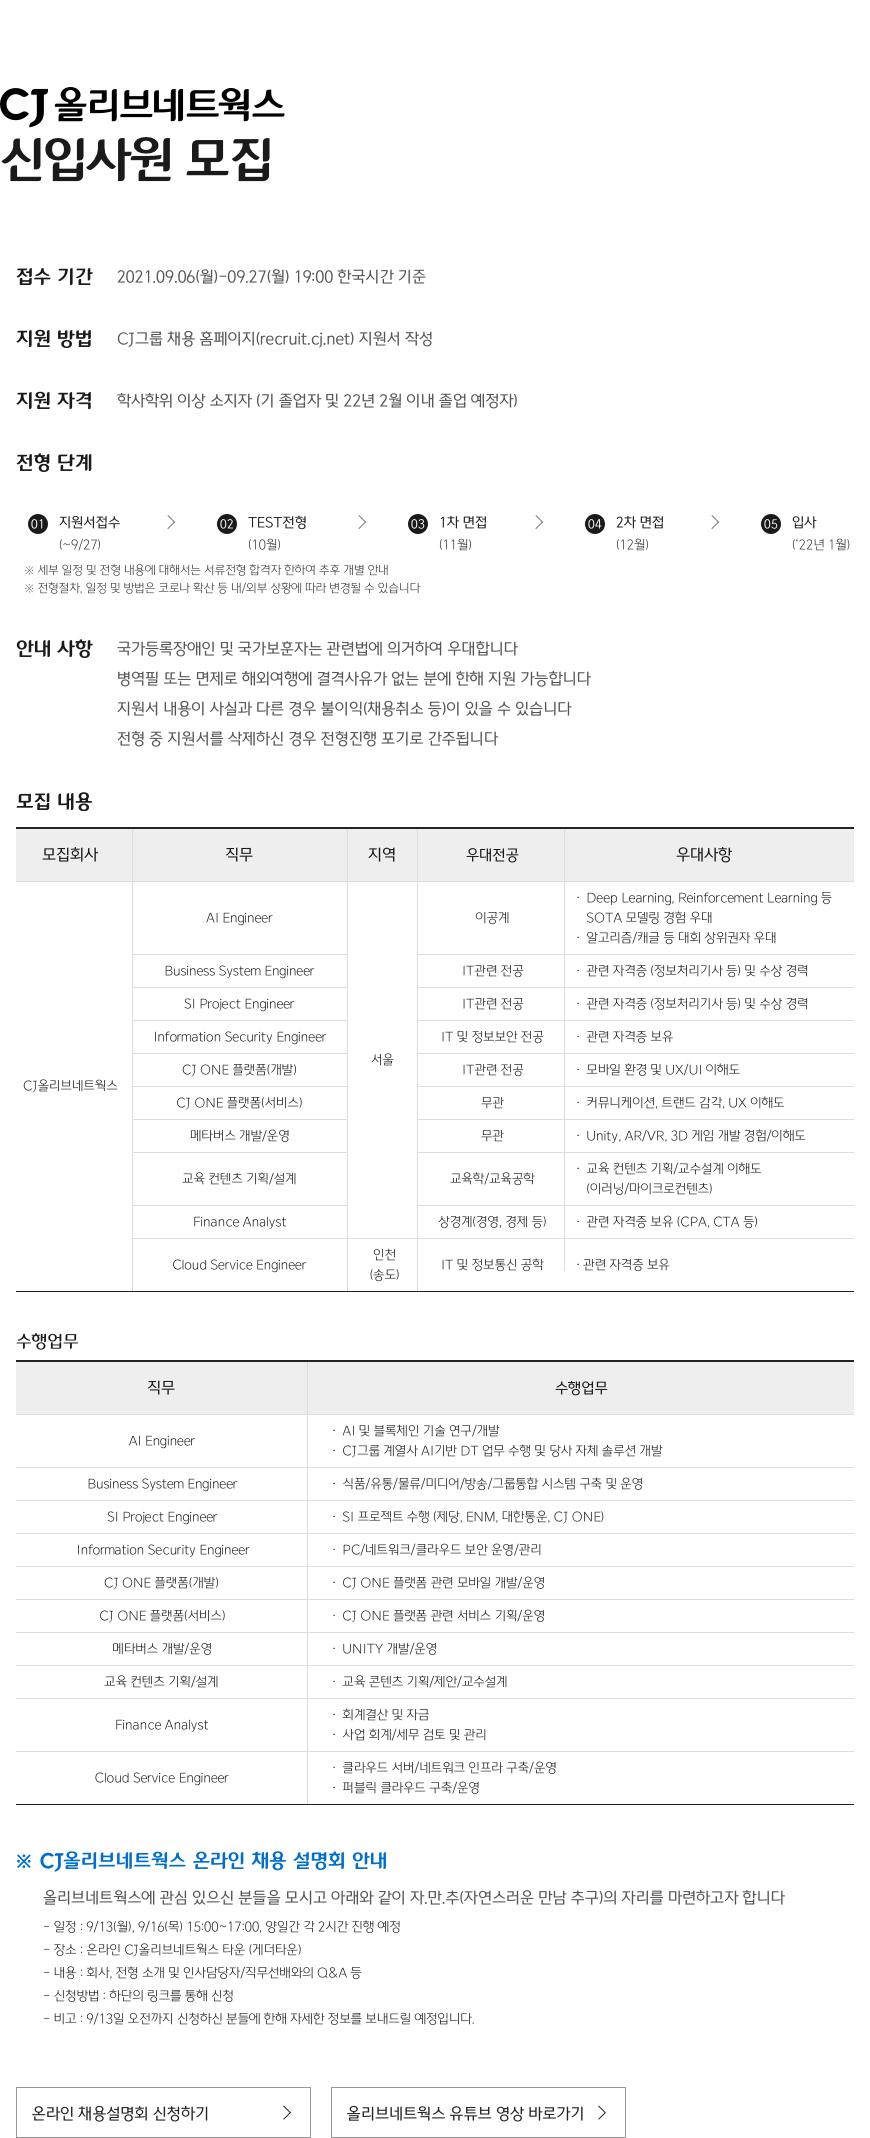 CJ 올리브네트웍스 신입사원 모집